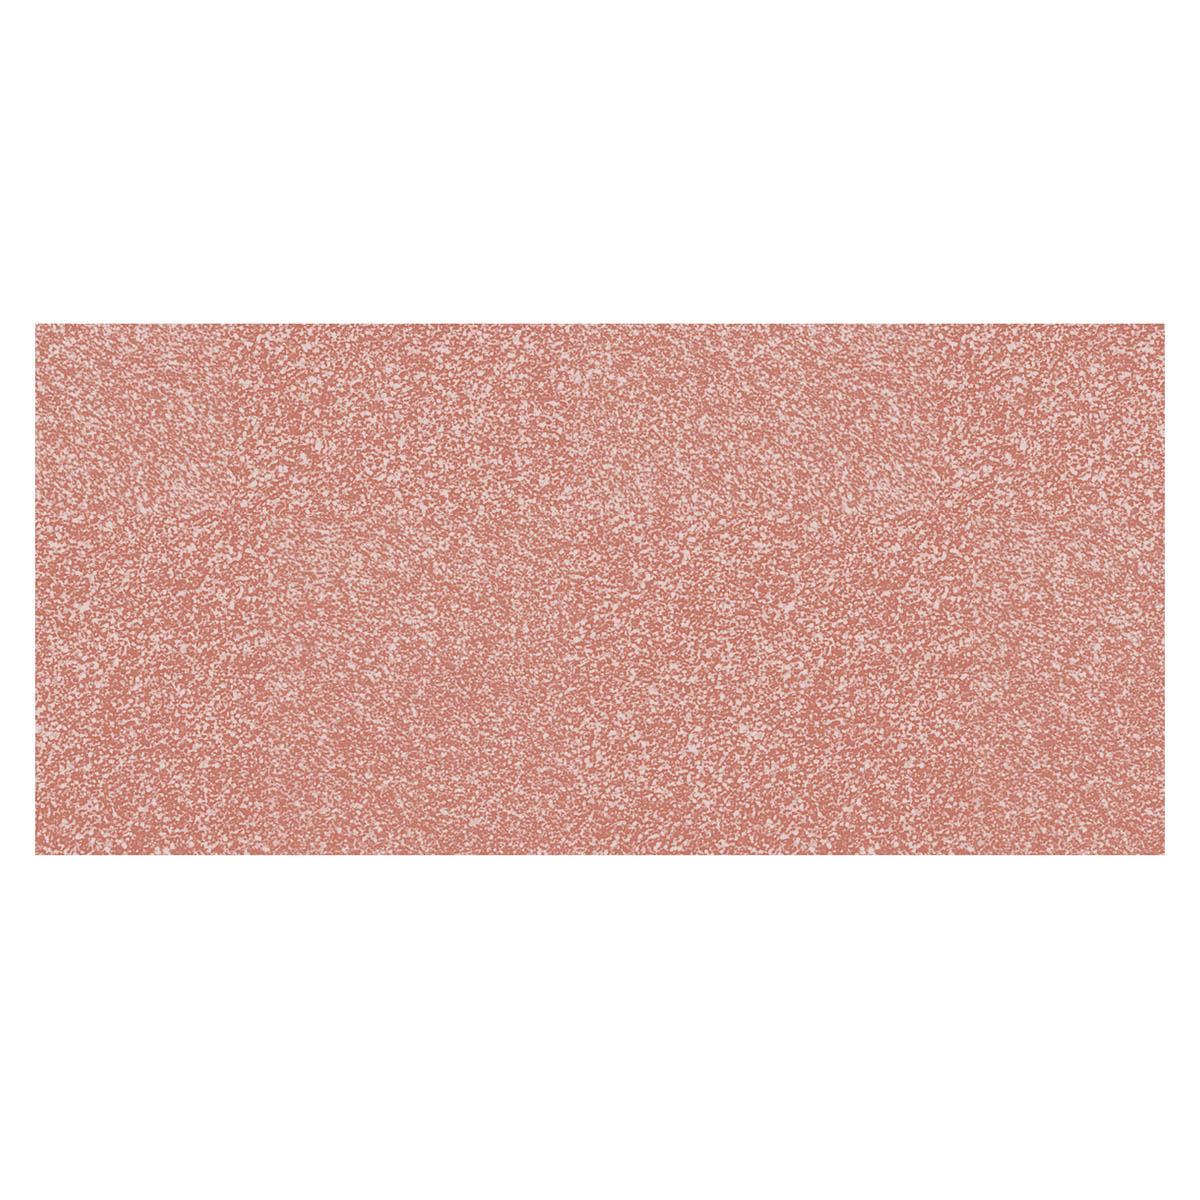 Waverly ® Inspirations Glitter Multi-Surface Acrylic Paint - Rose Gold, 2 oz.